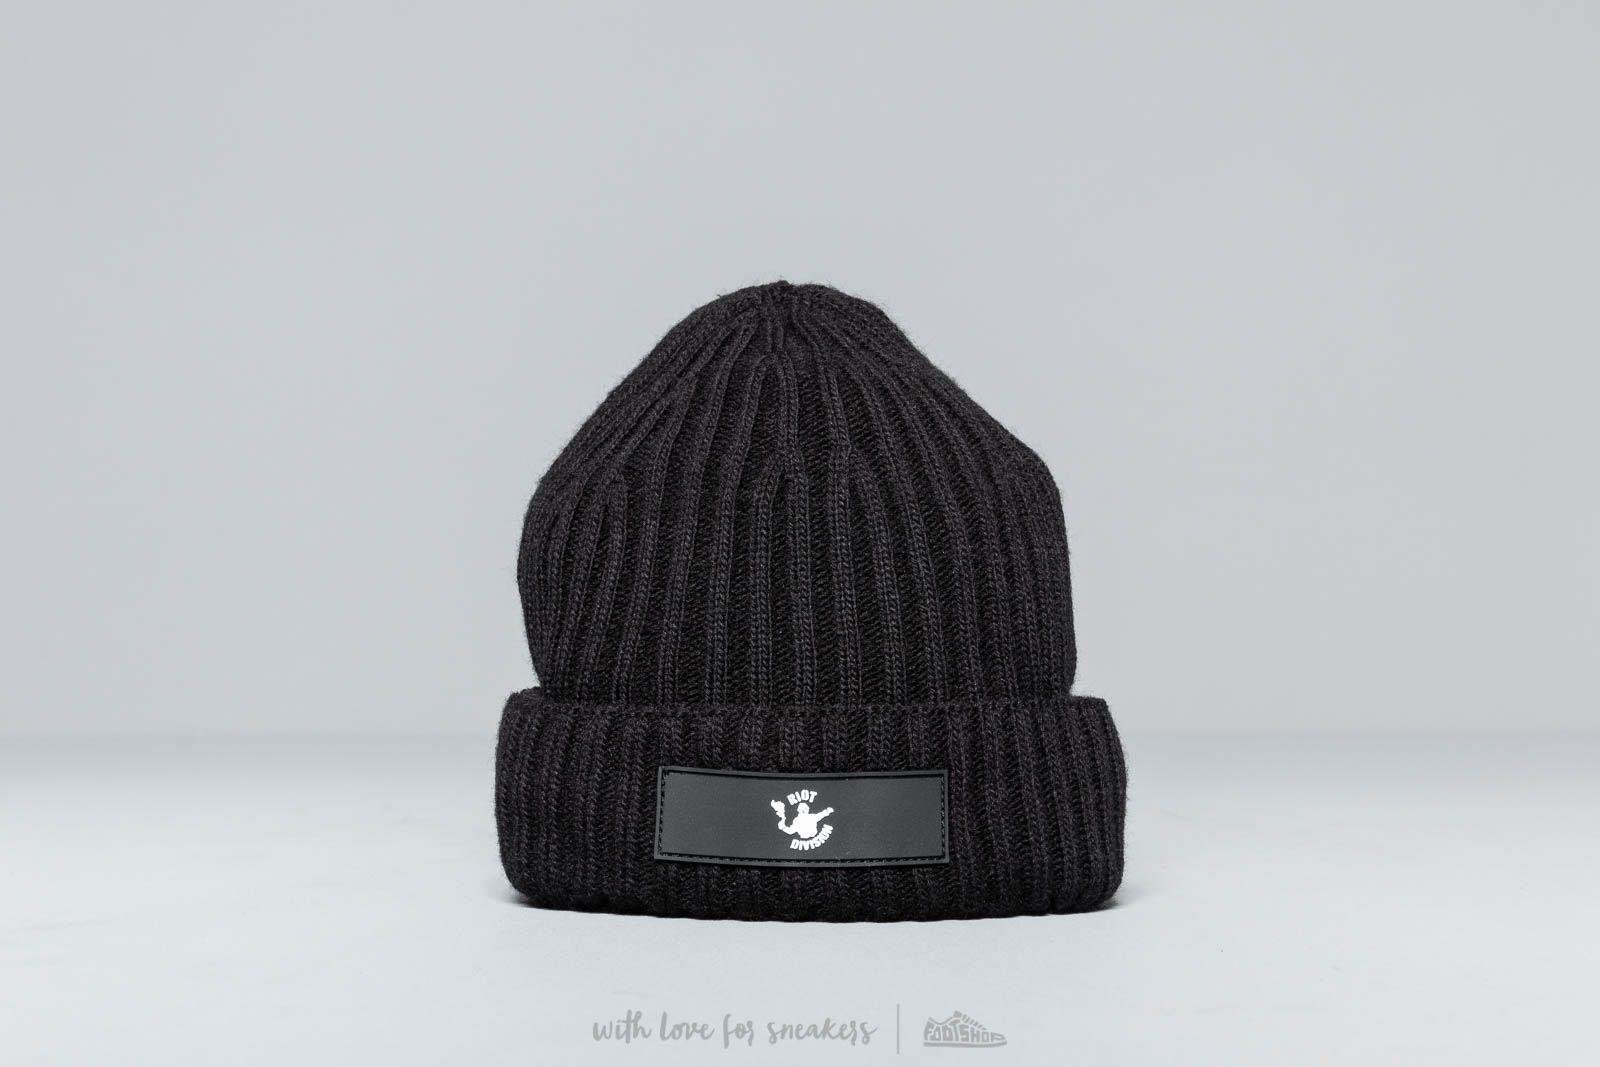 Riot Division Stealth Hat